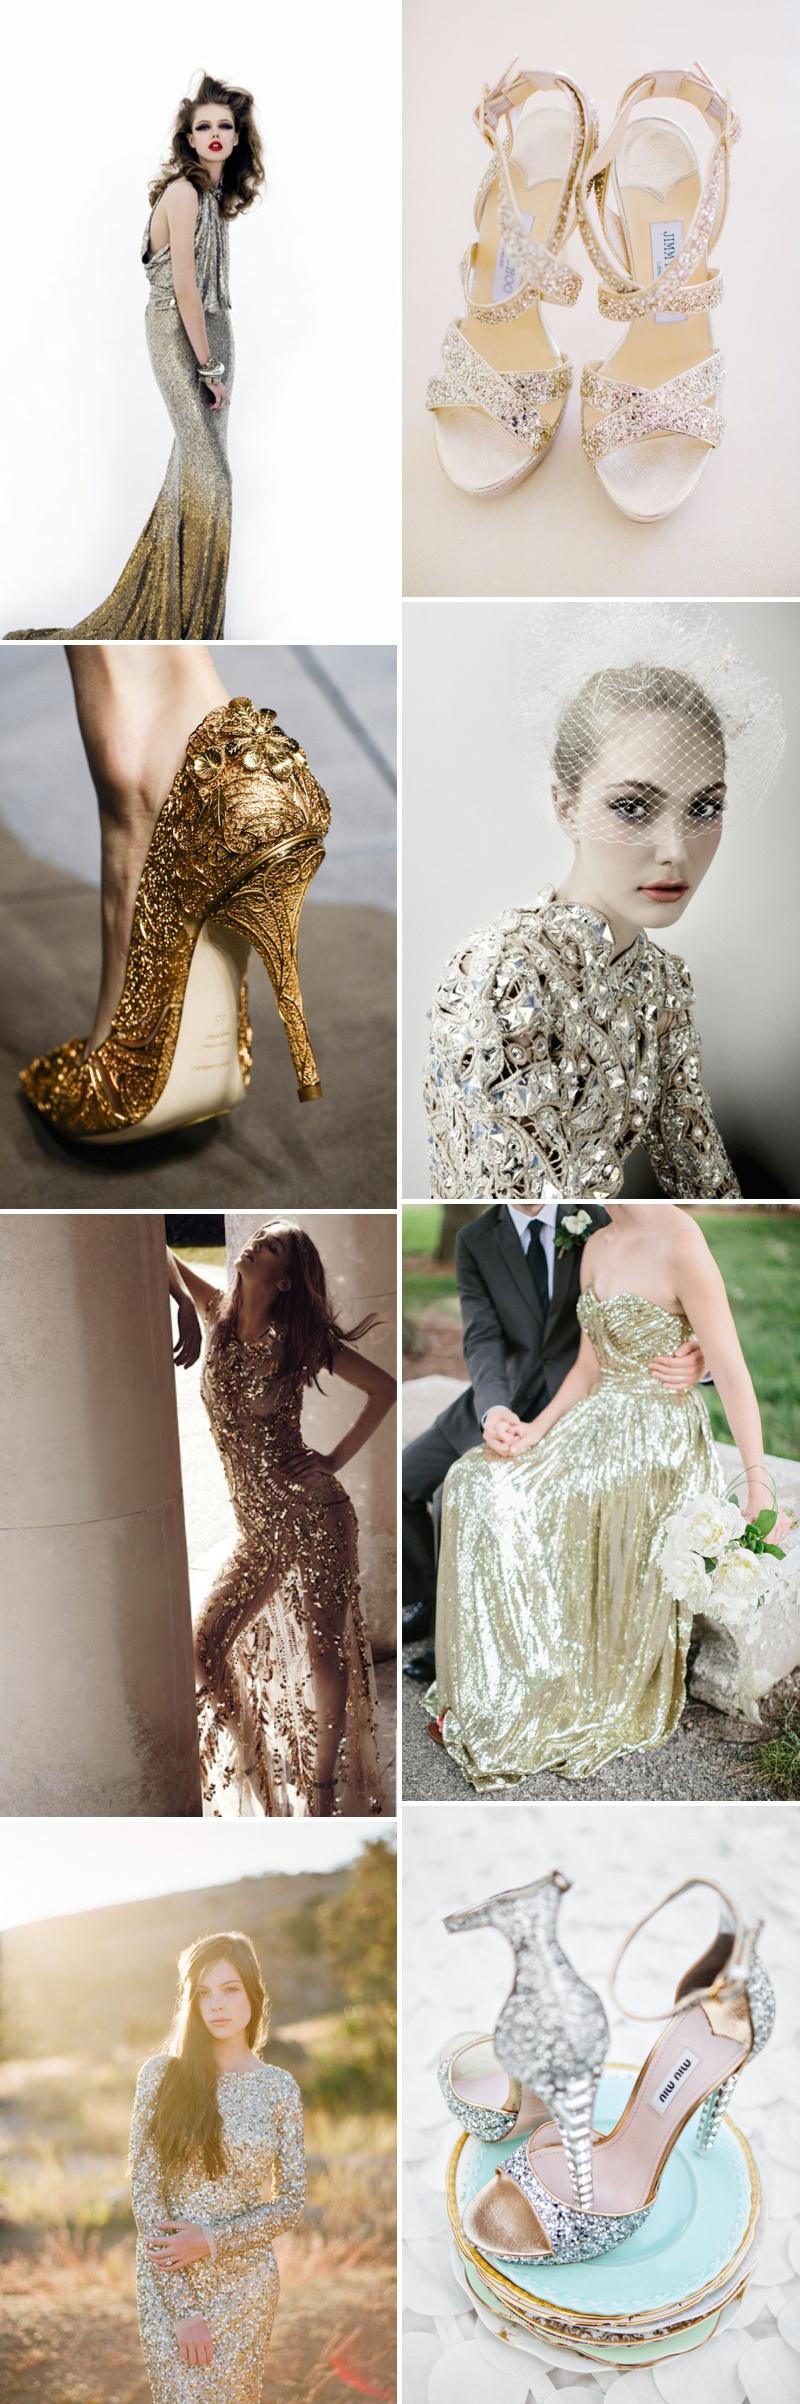 Golden Girls Wedding Inspiration